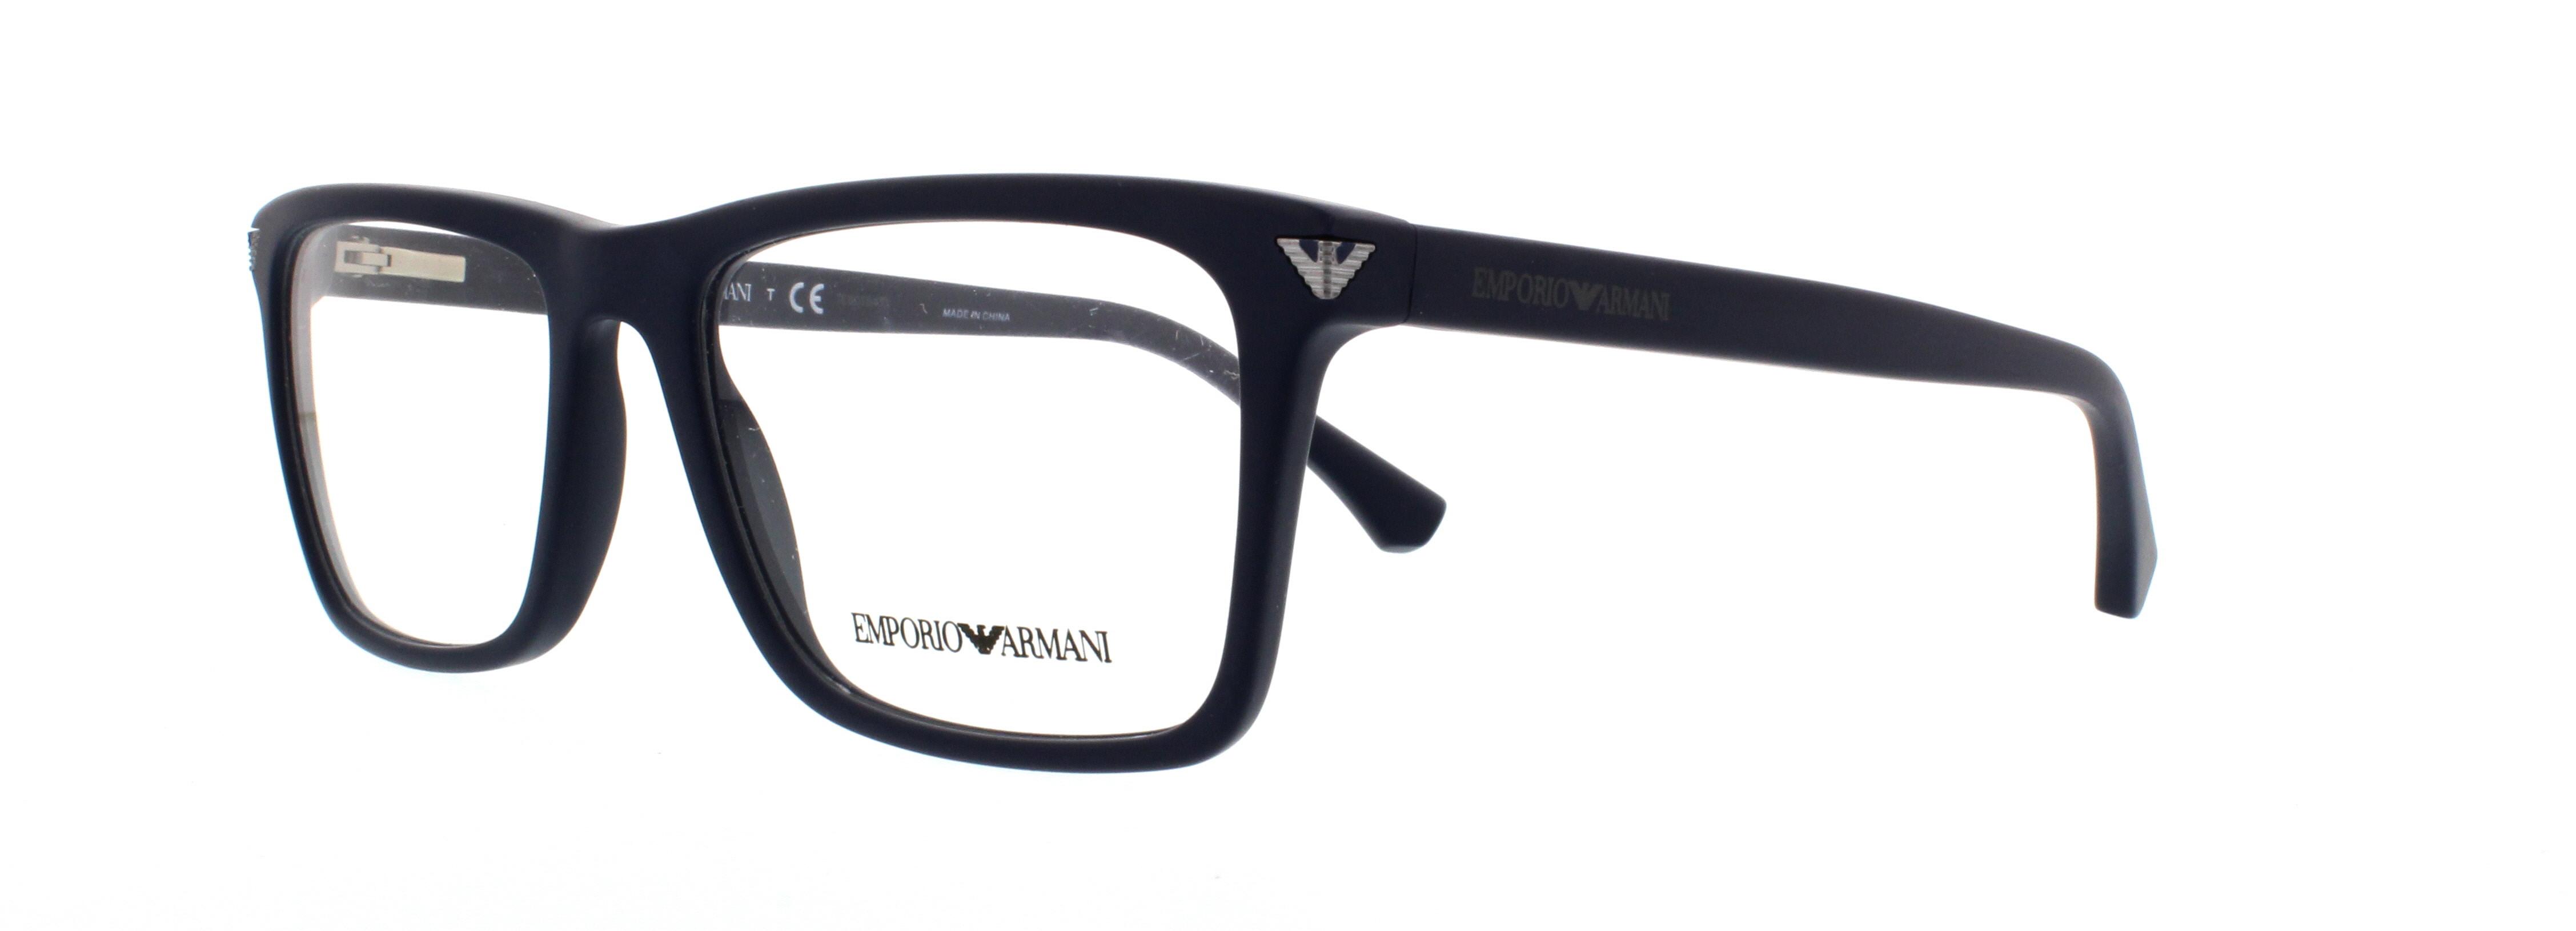 emporio armani eyeglasses ea3071 5452 matte blue 55mm - Emporio Armani Frames